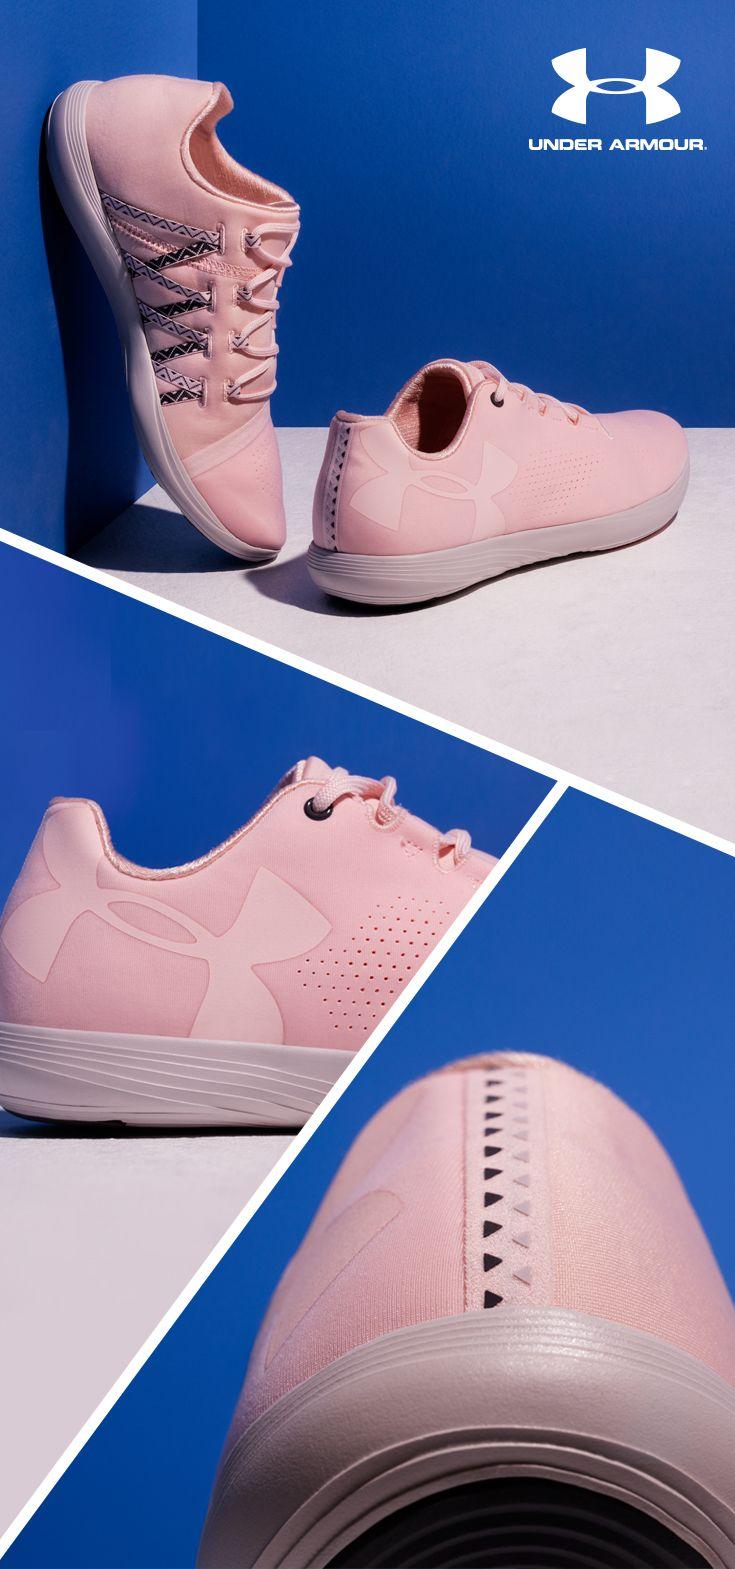 Under armour shoes, Fashion gym wear